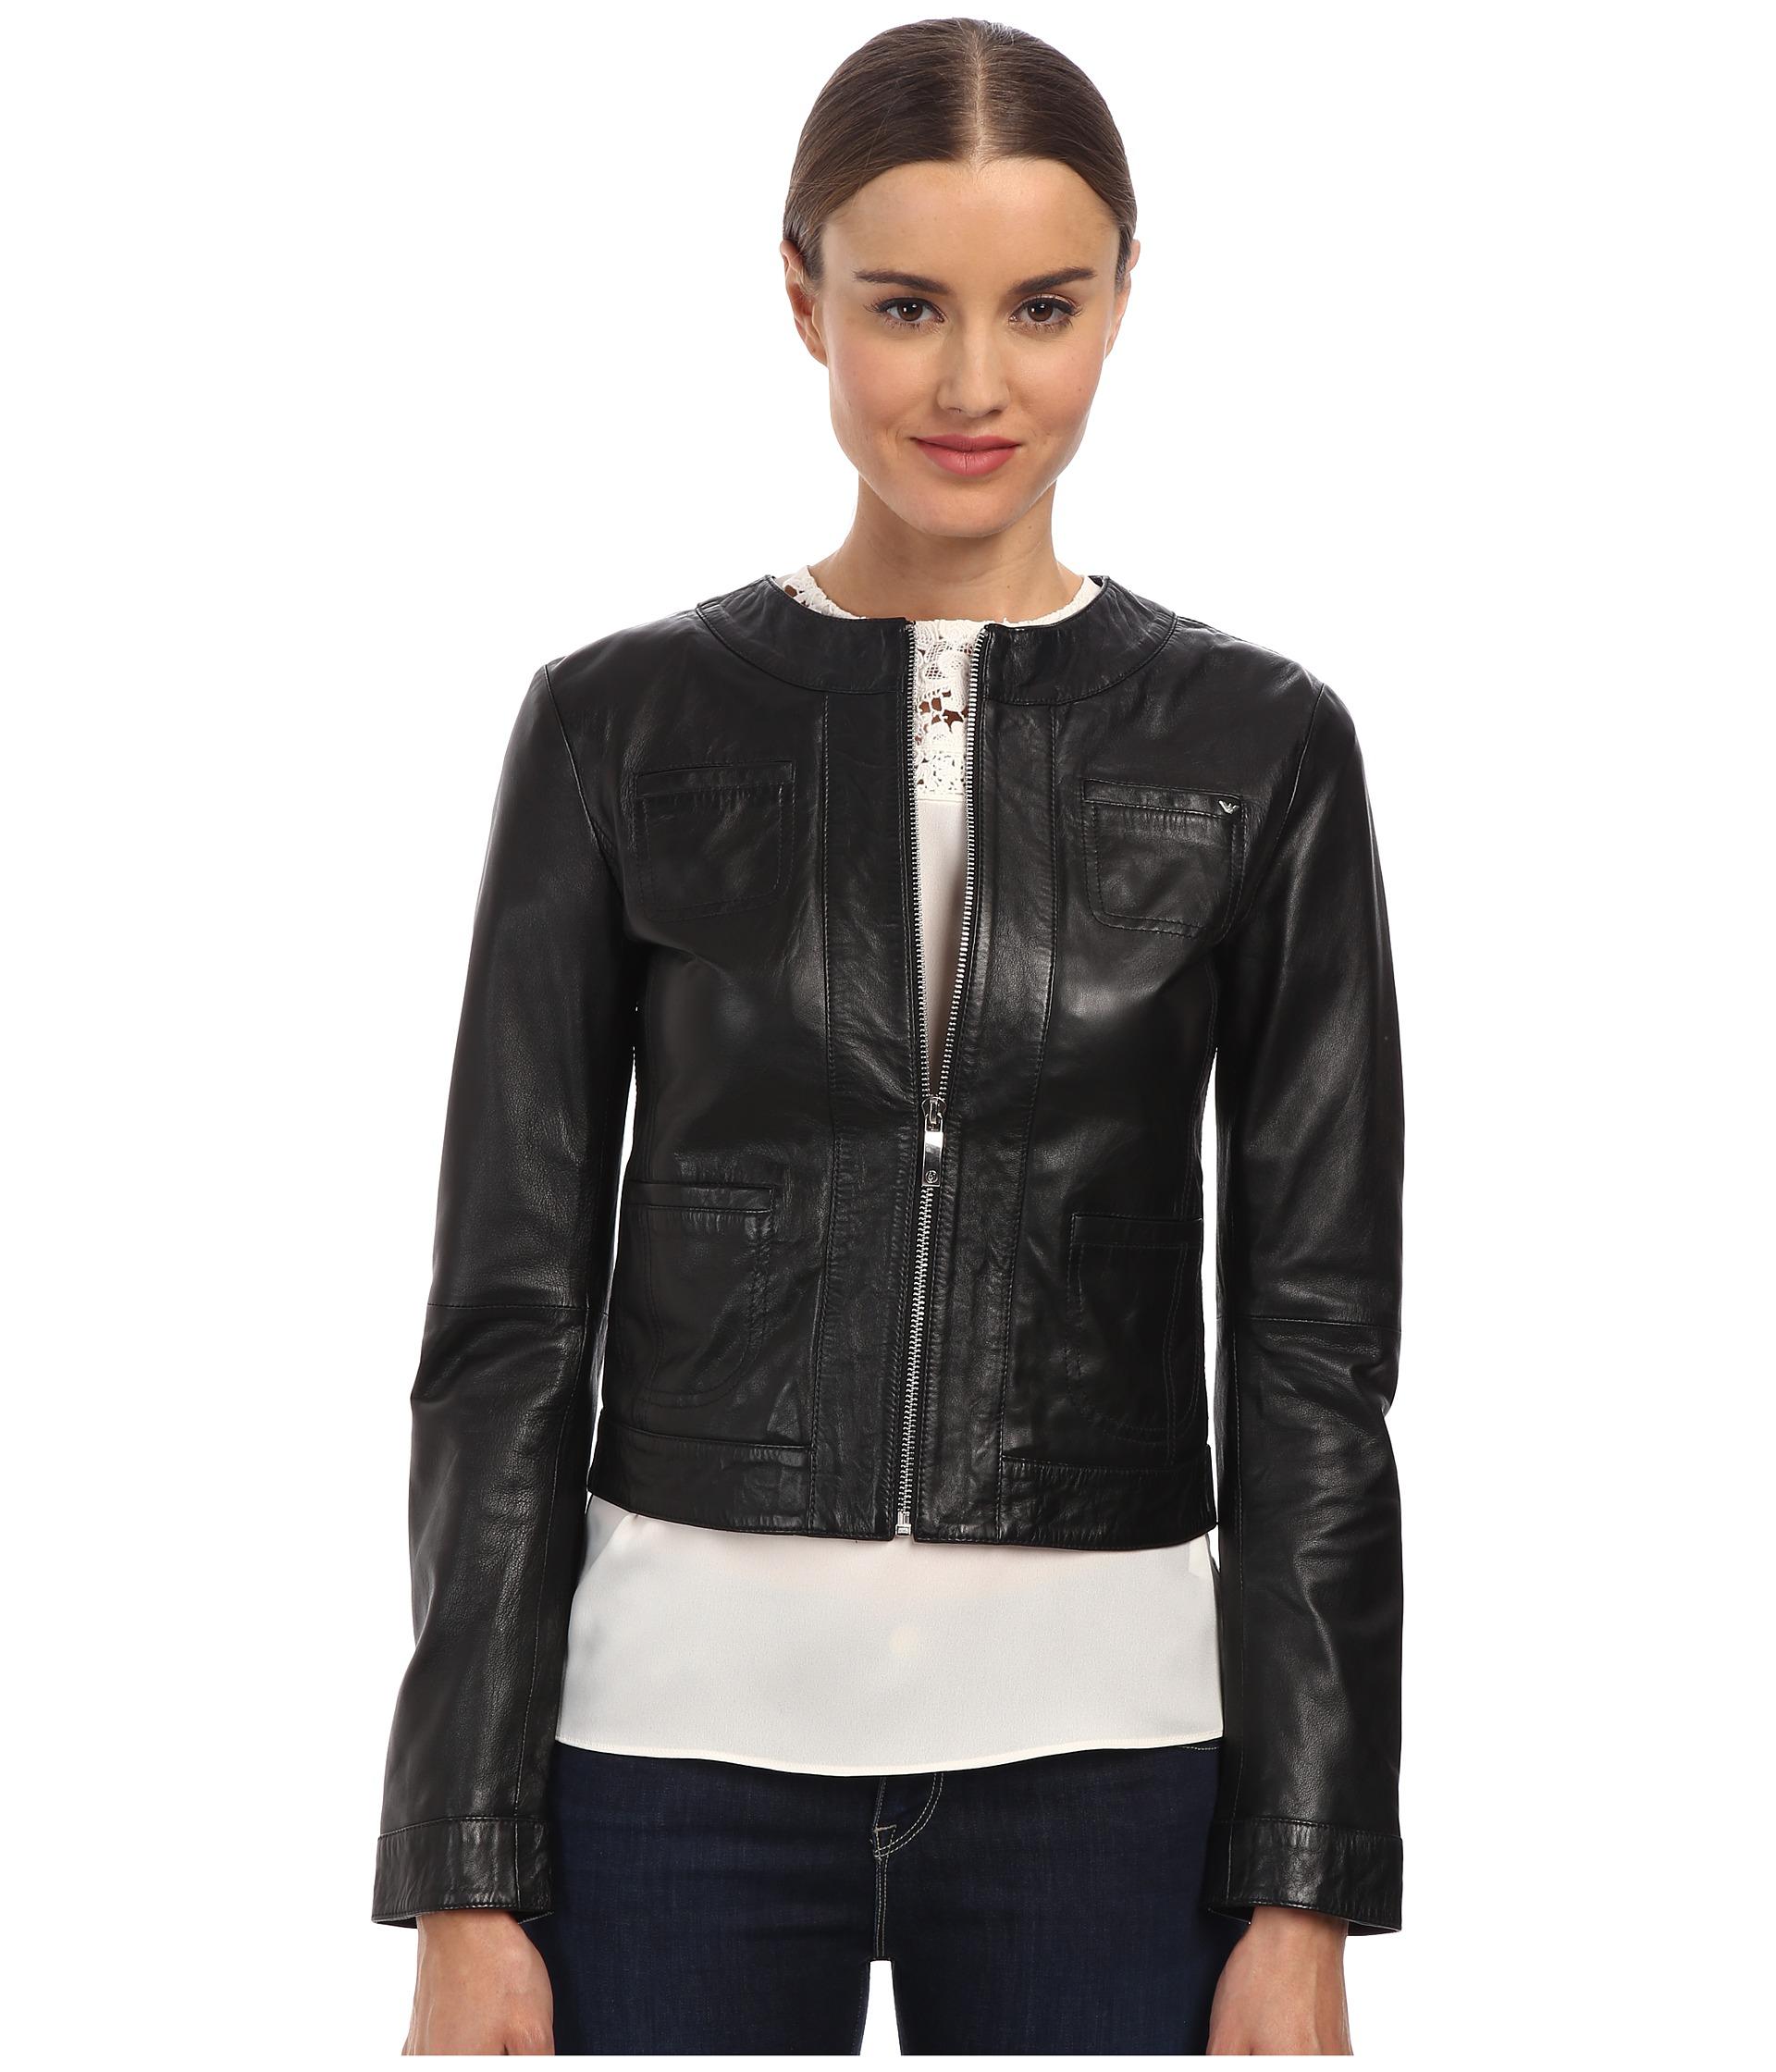 Armani jeans Leather Jacket in Black